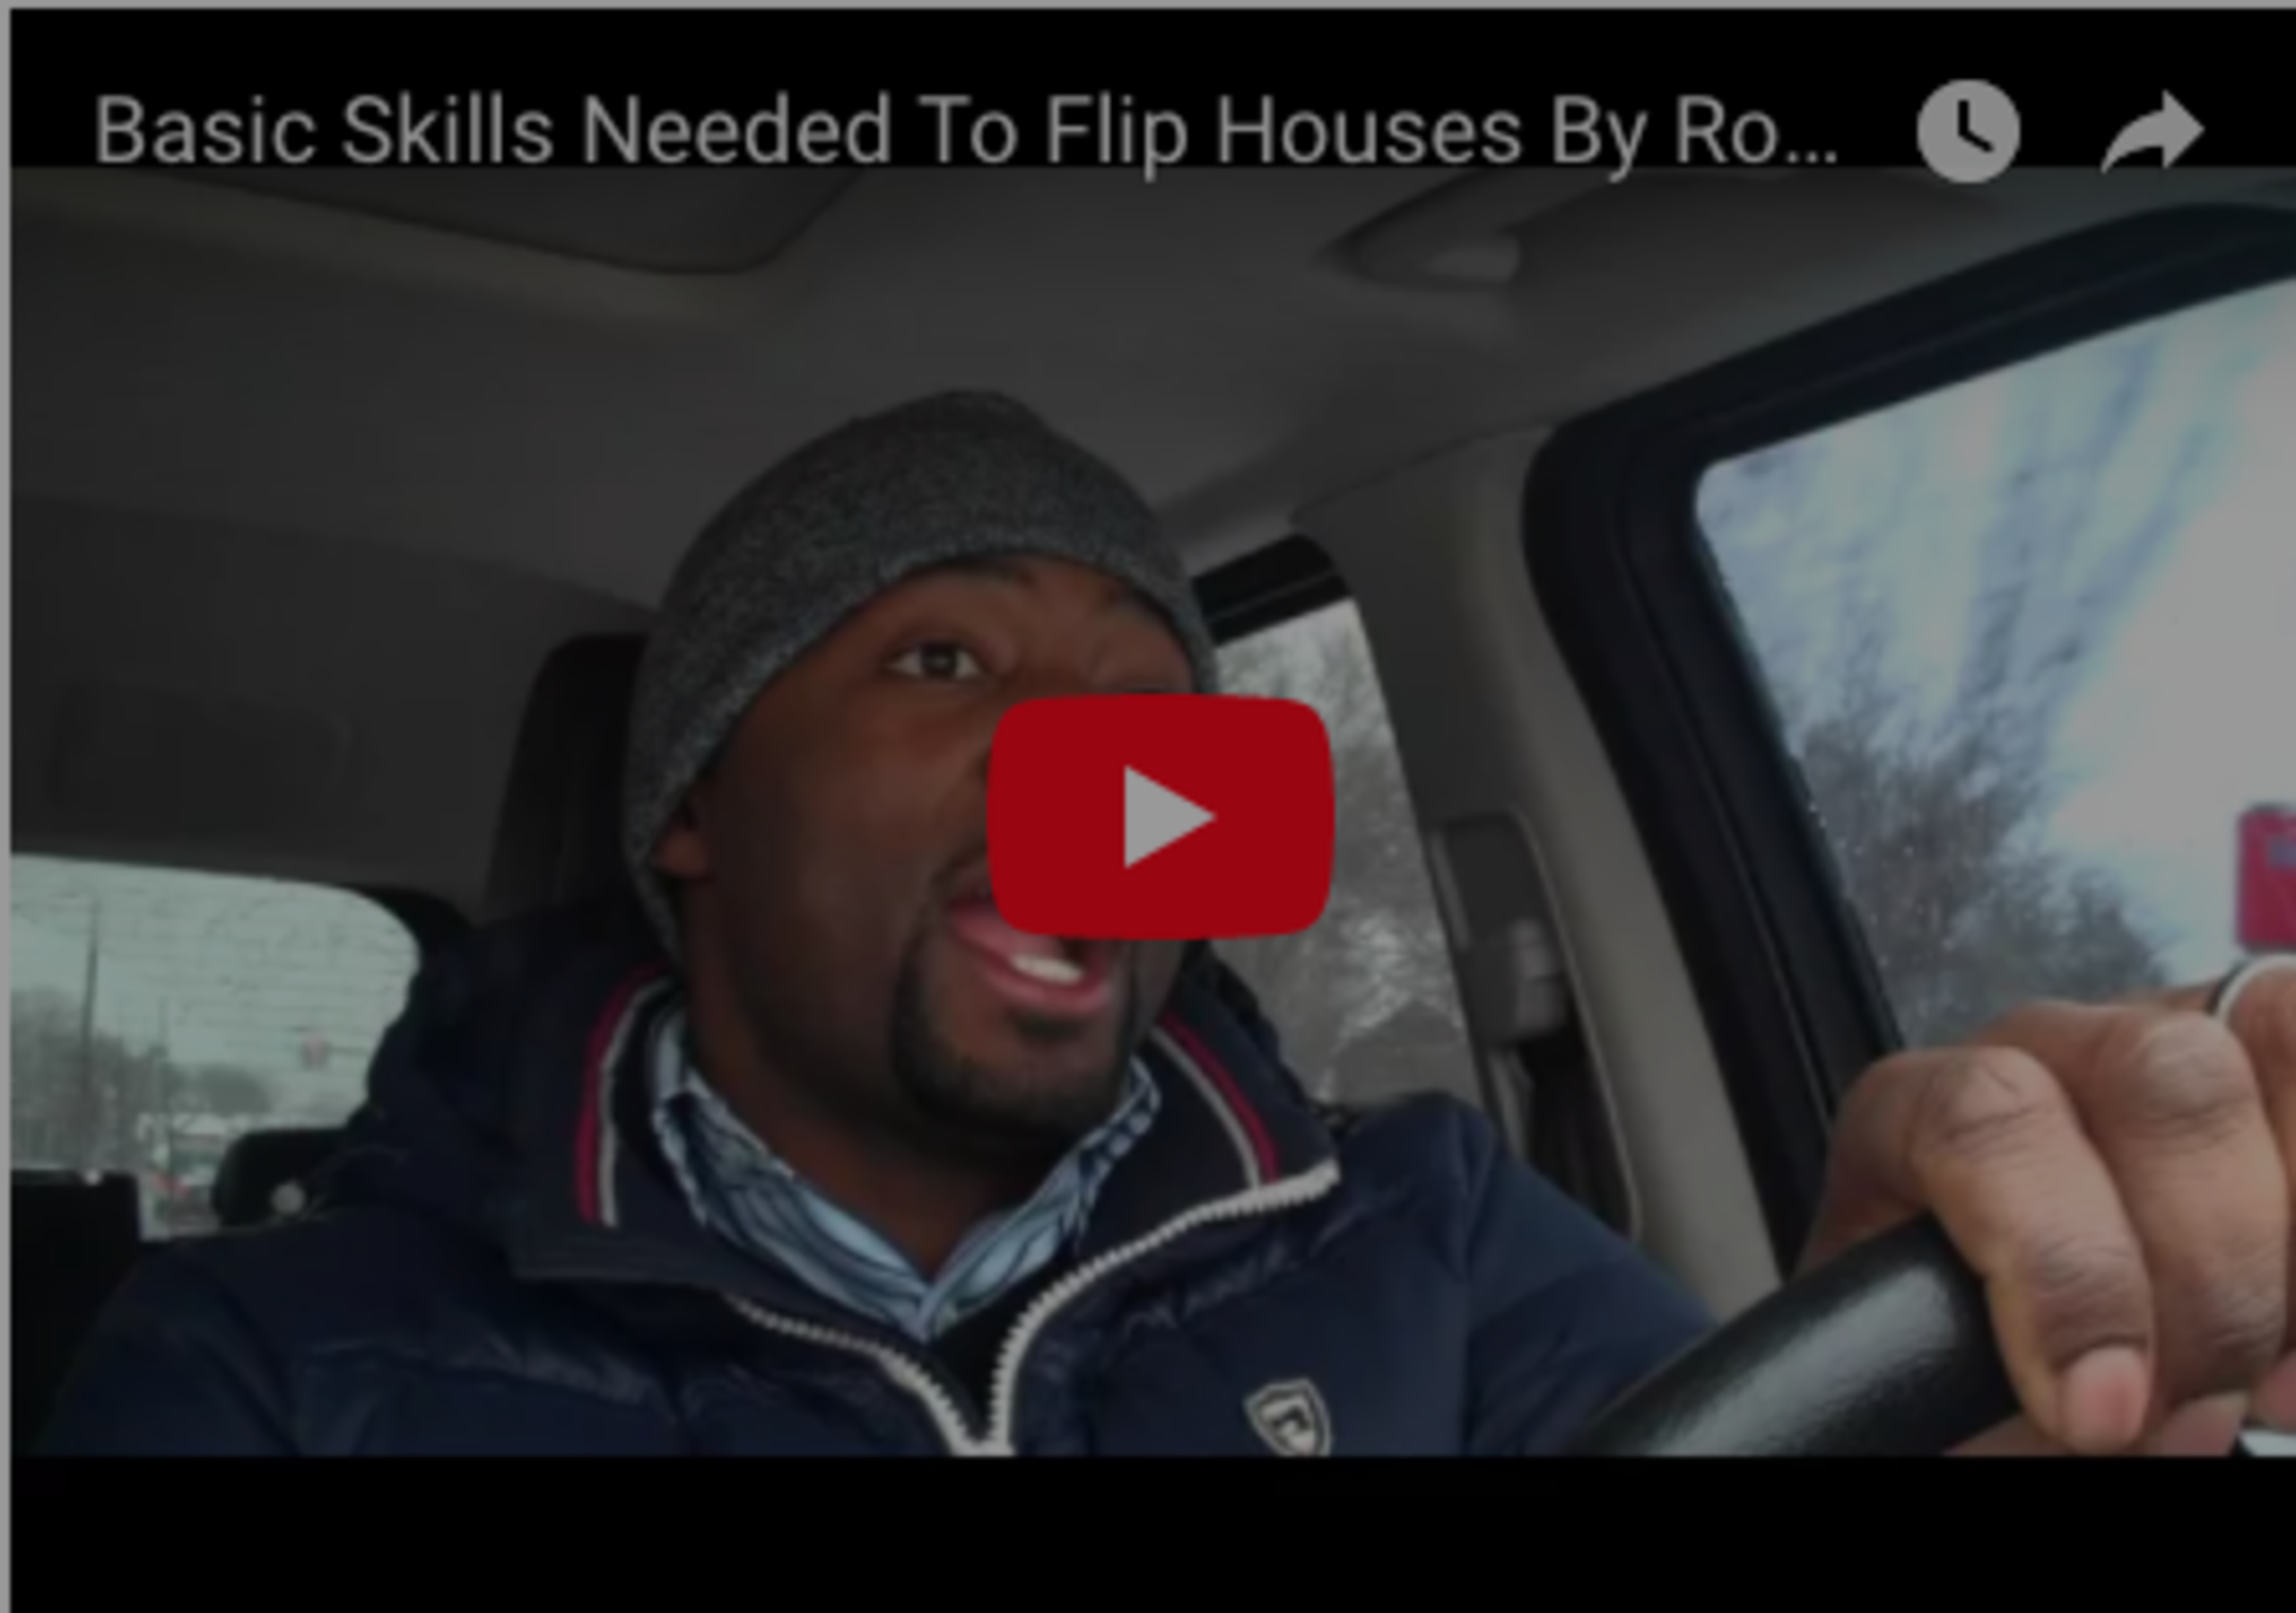 Basic Skills Needed To Flip Houses